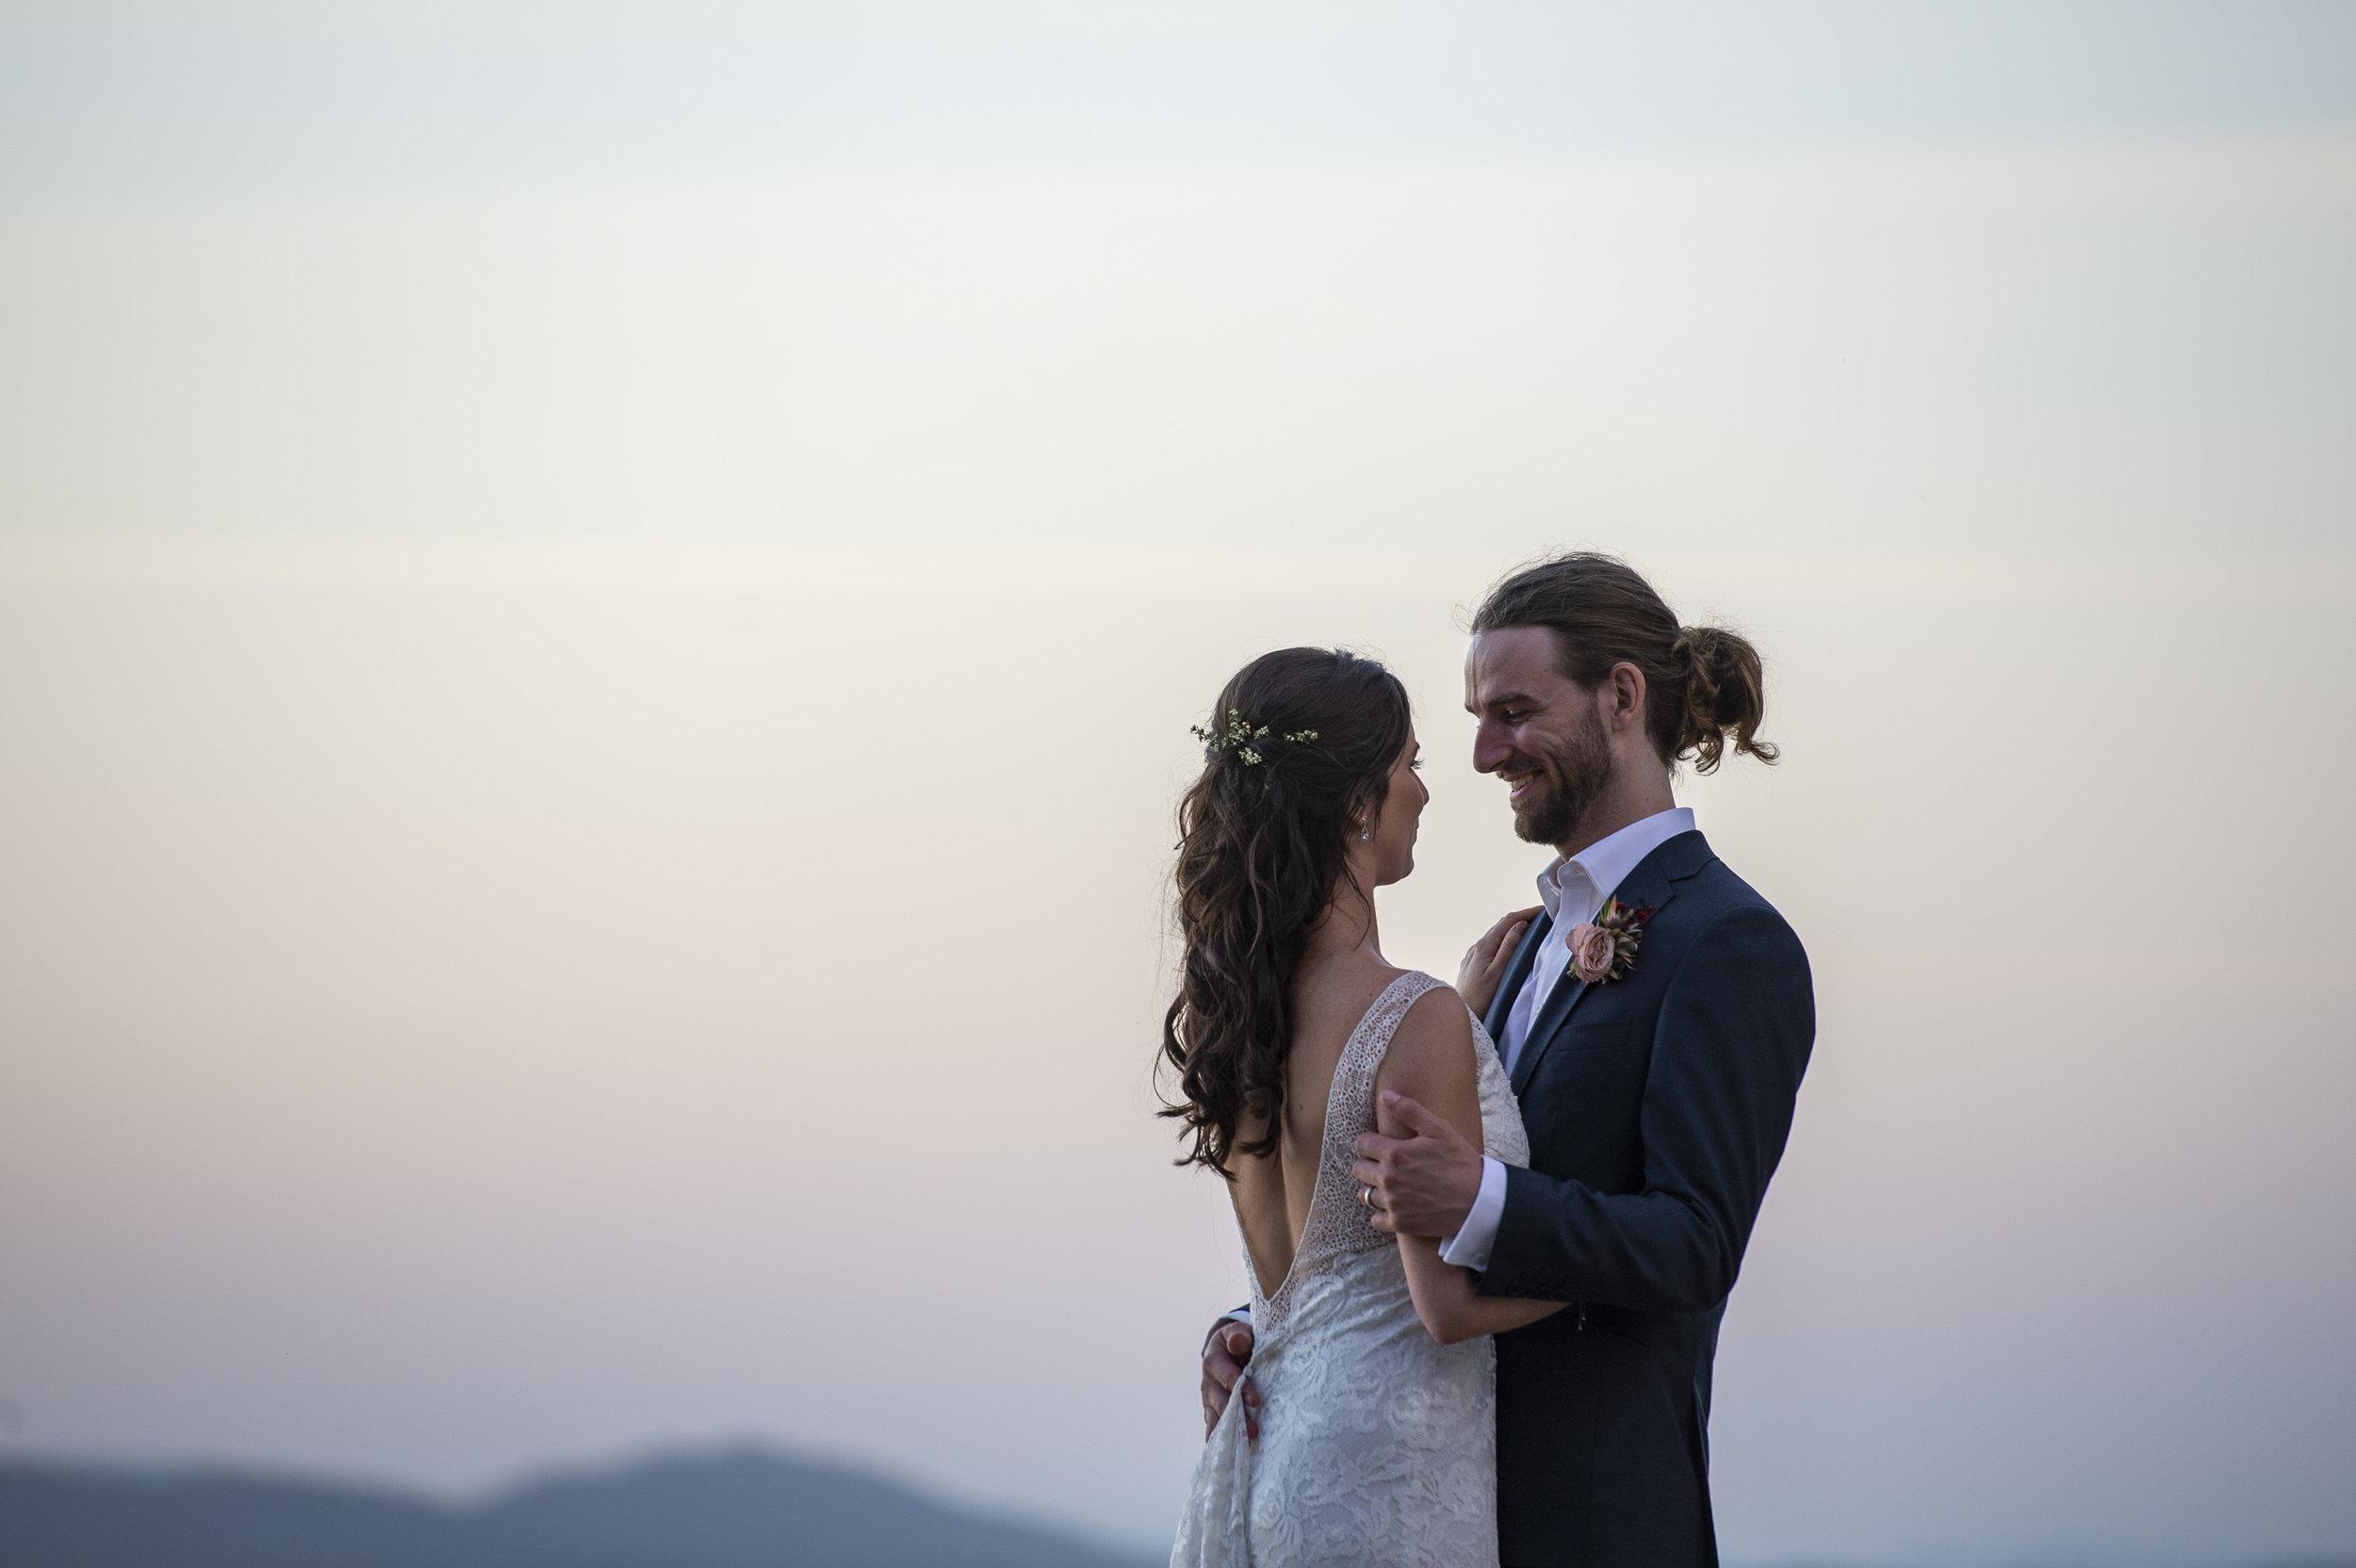 weddings by atelier photography-wedding-34.jpg